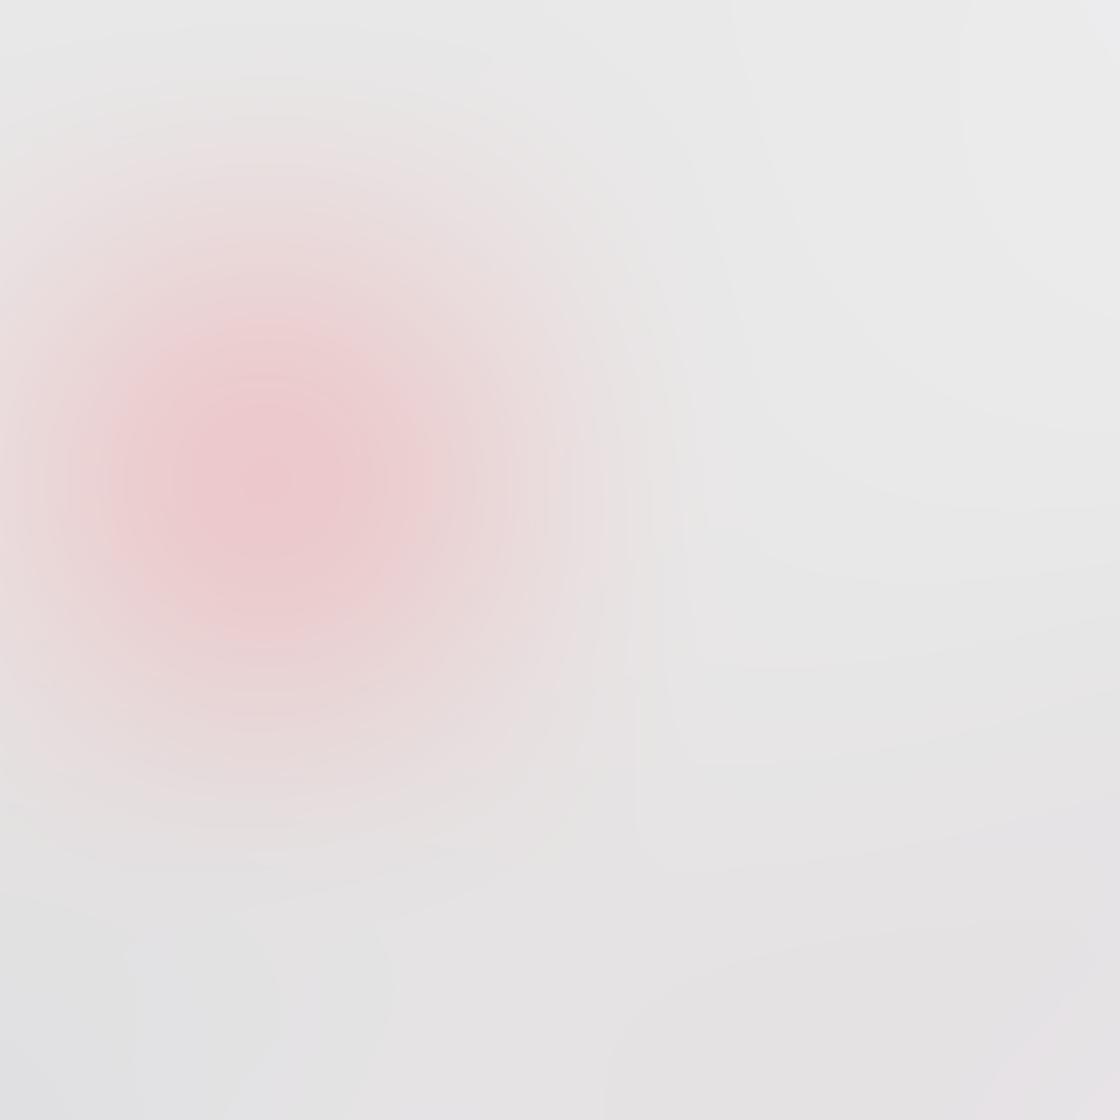 iPhone Photography Snow 122